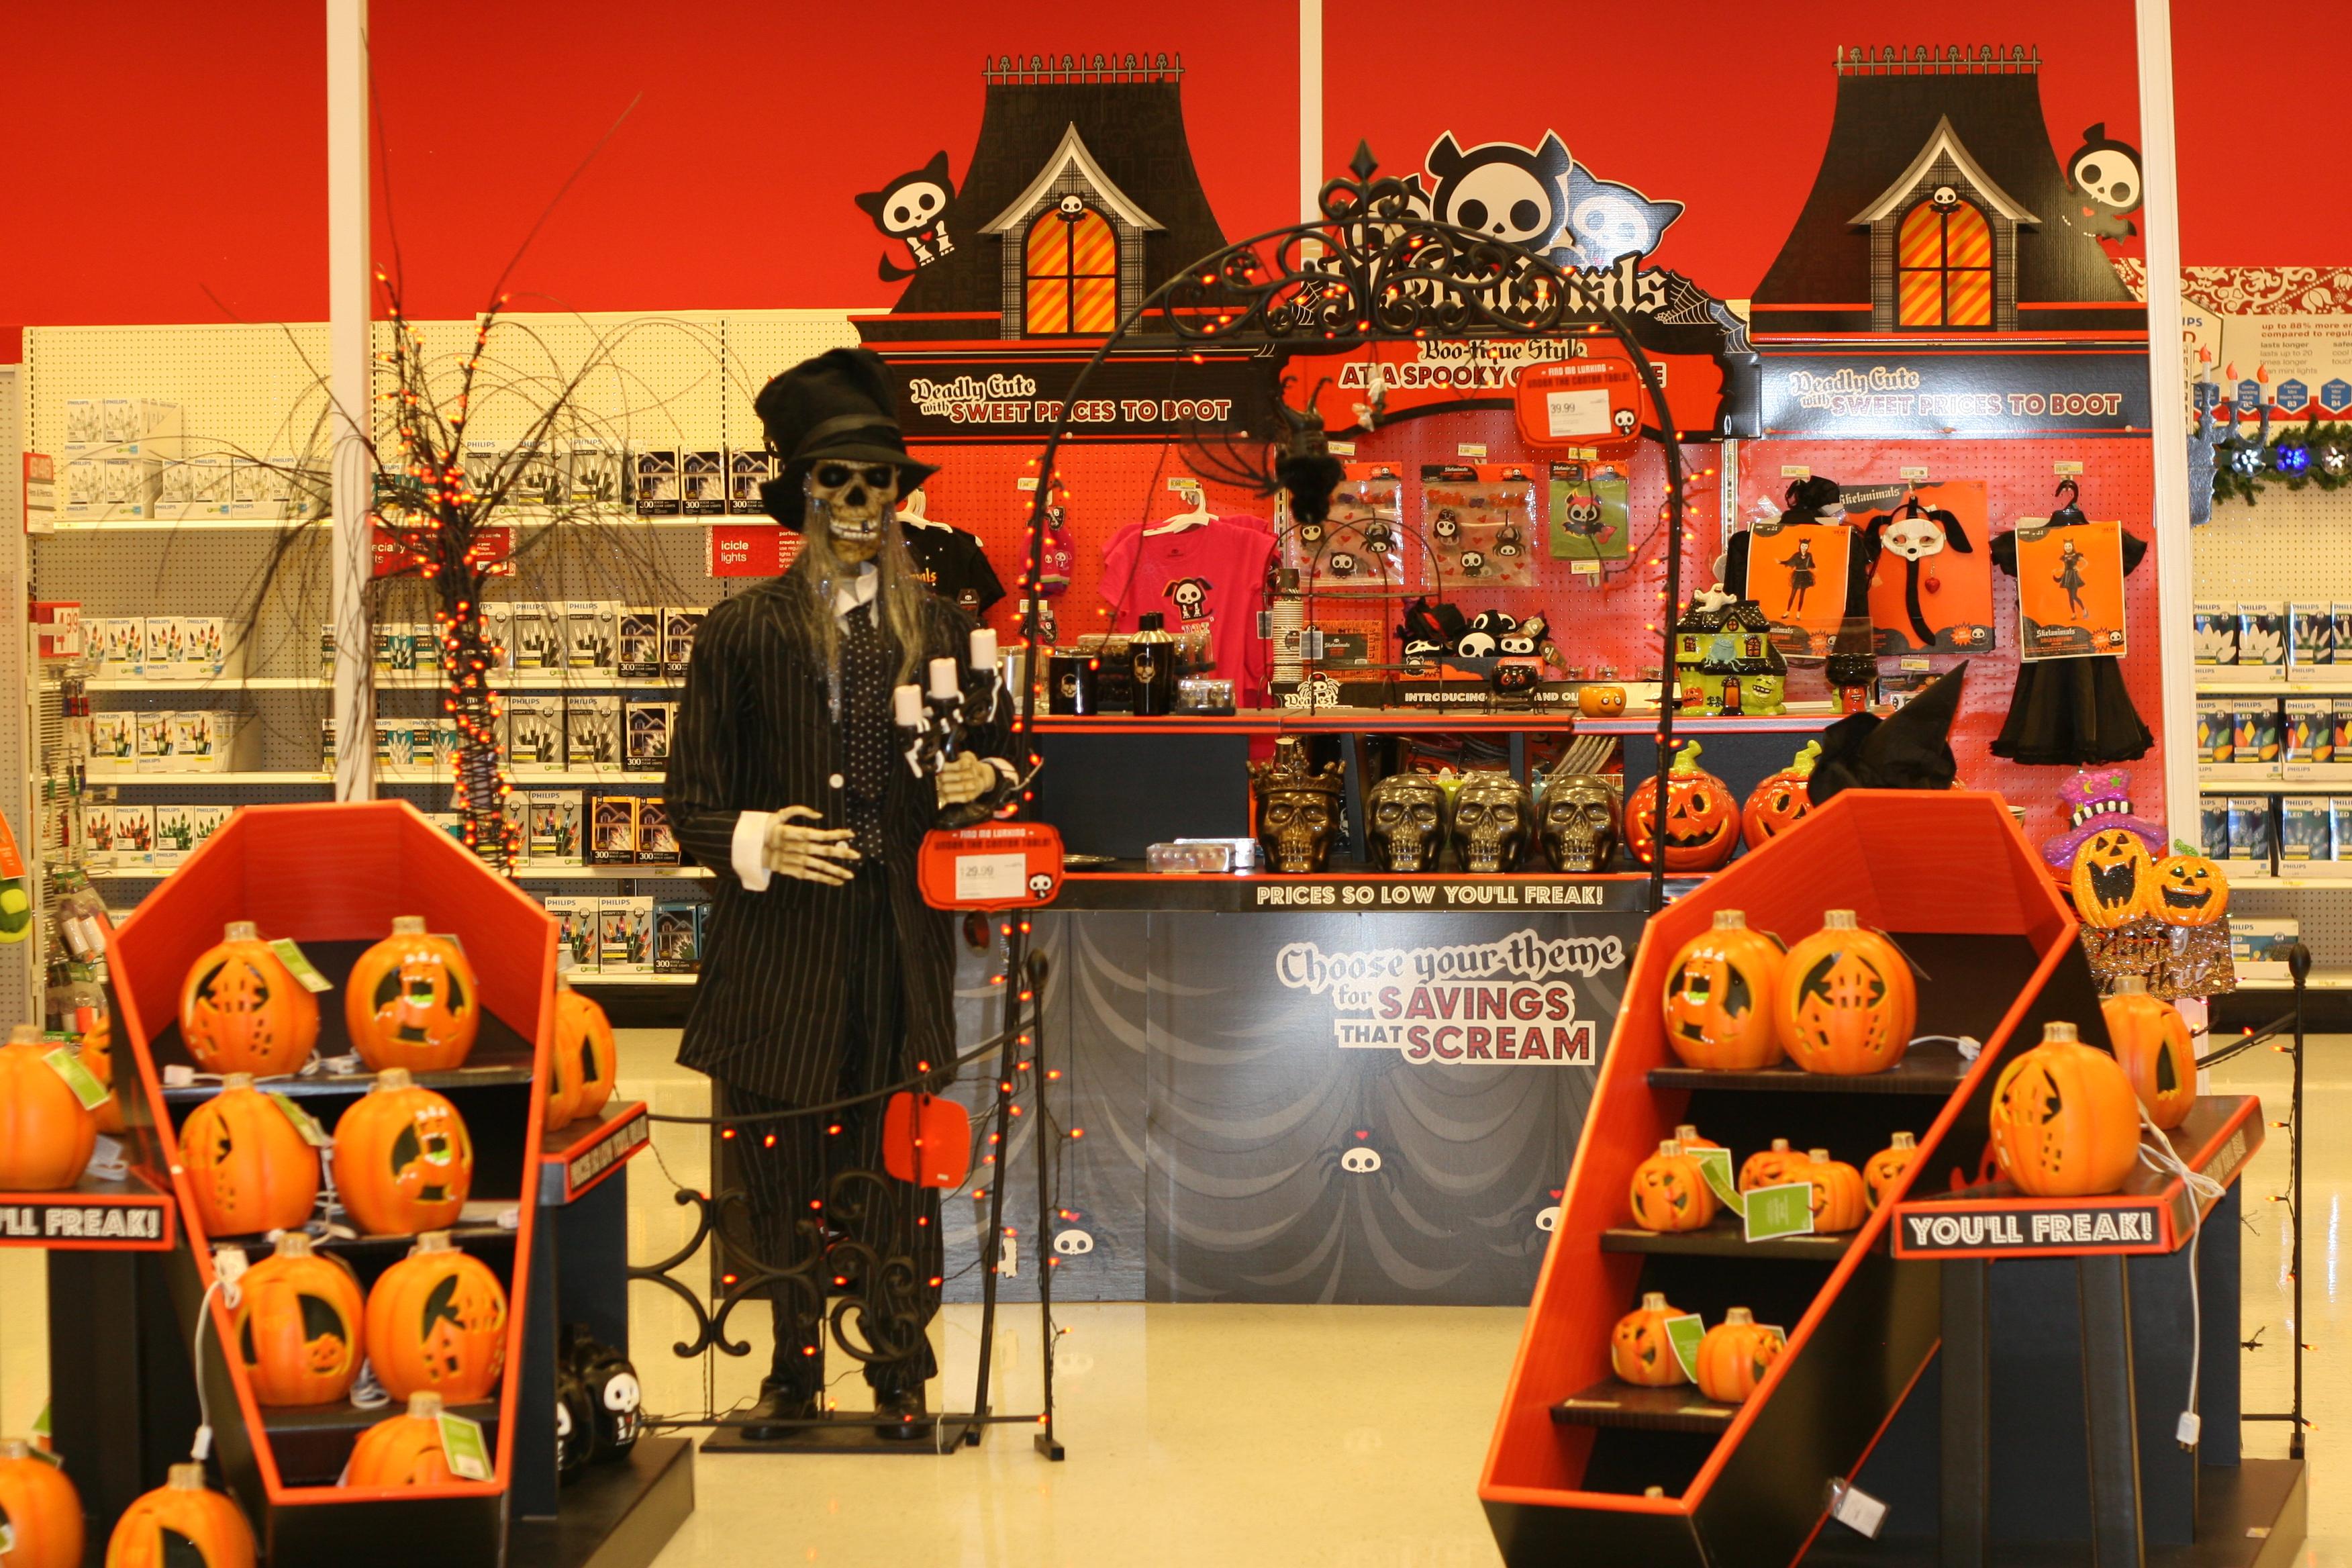 halloween hysteria target halloween display - Target Halloween